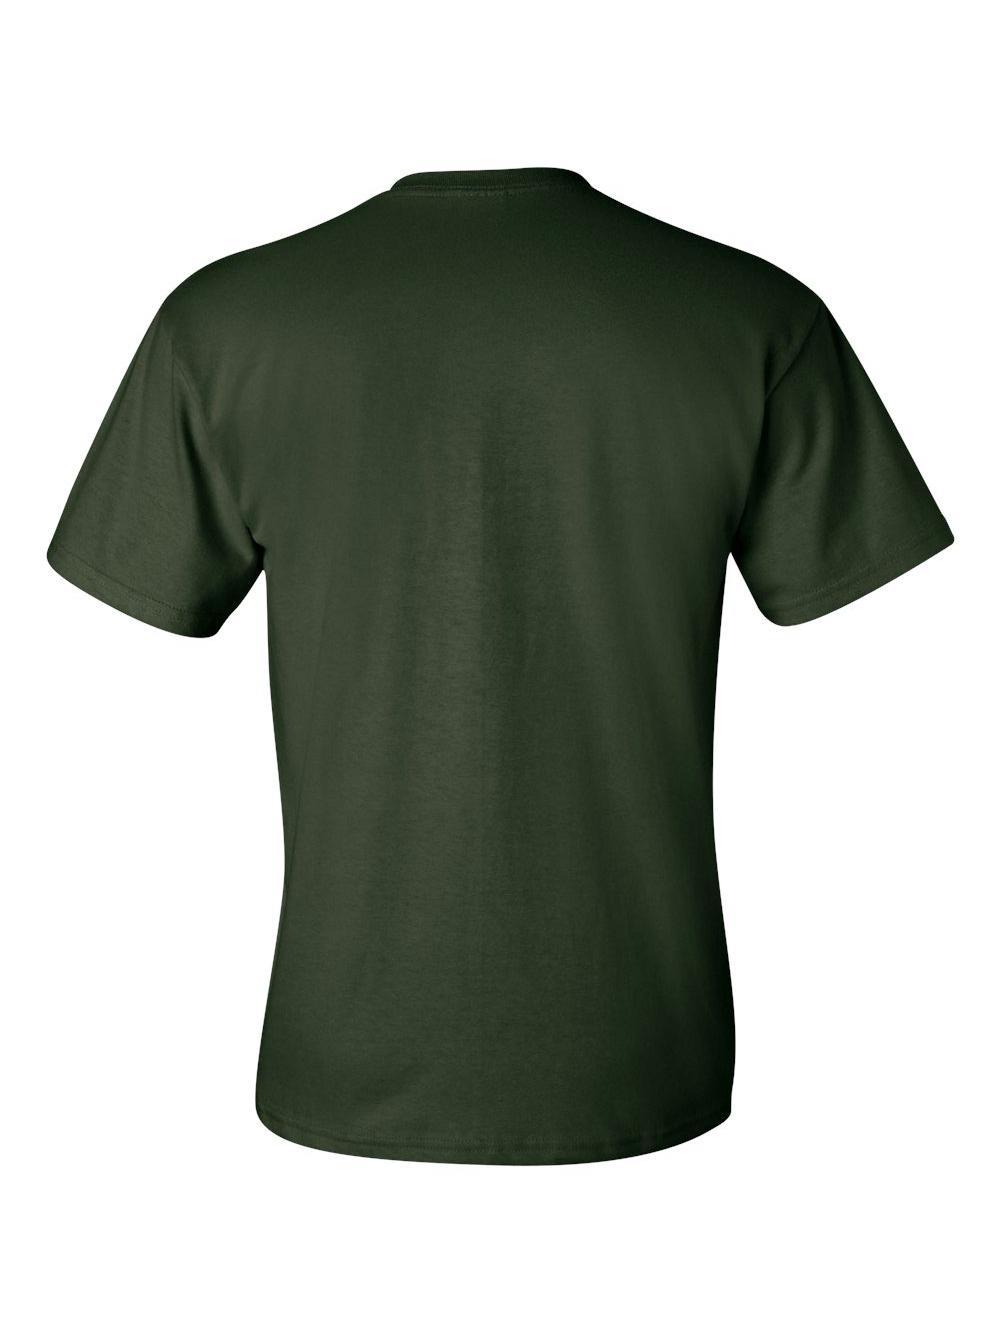 Gildan-Ultra-Cotton-T-Shirt-with-a-Pocket-2300 thumbnail 13